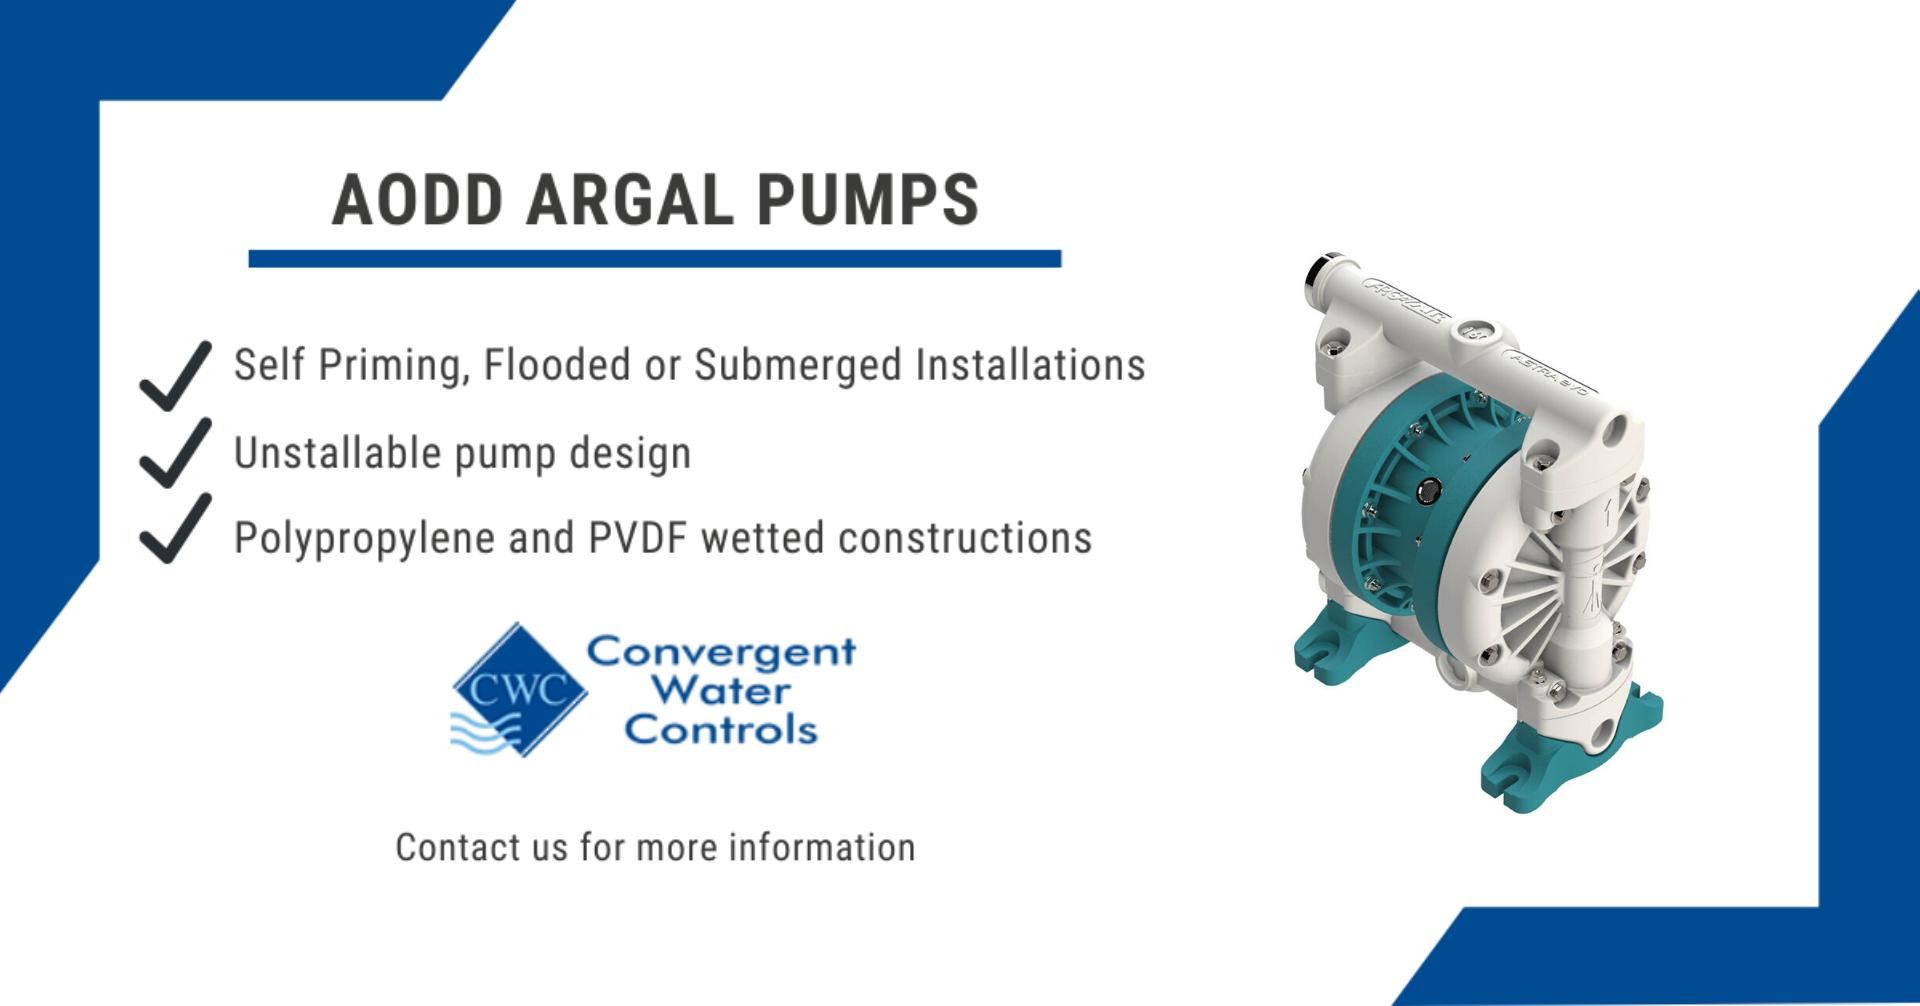 AODD Argal Pumps - Contact us for more information